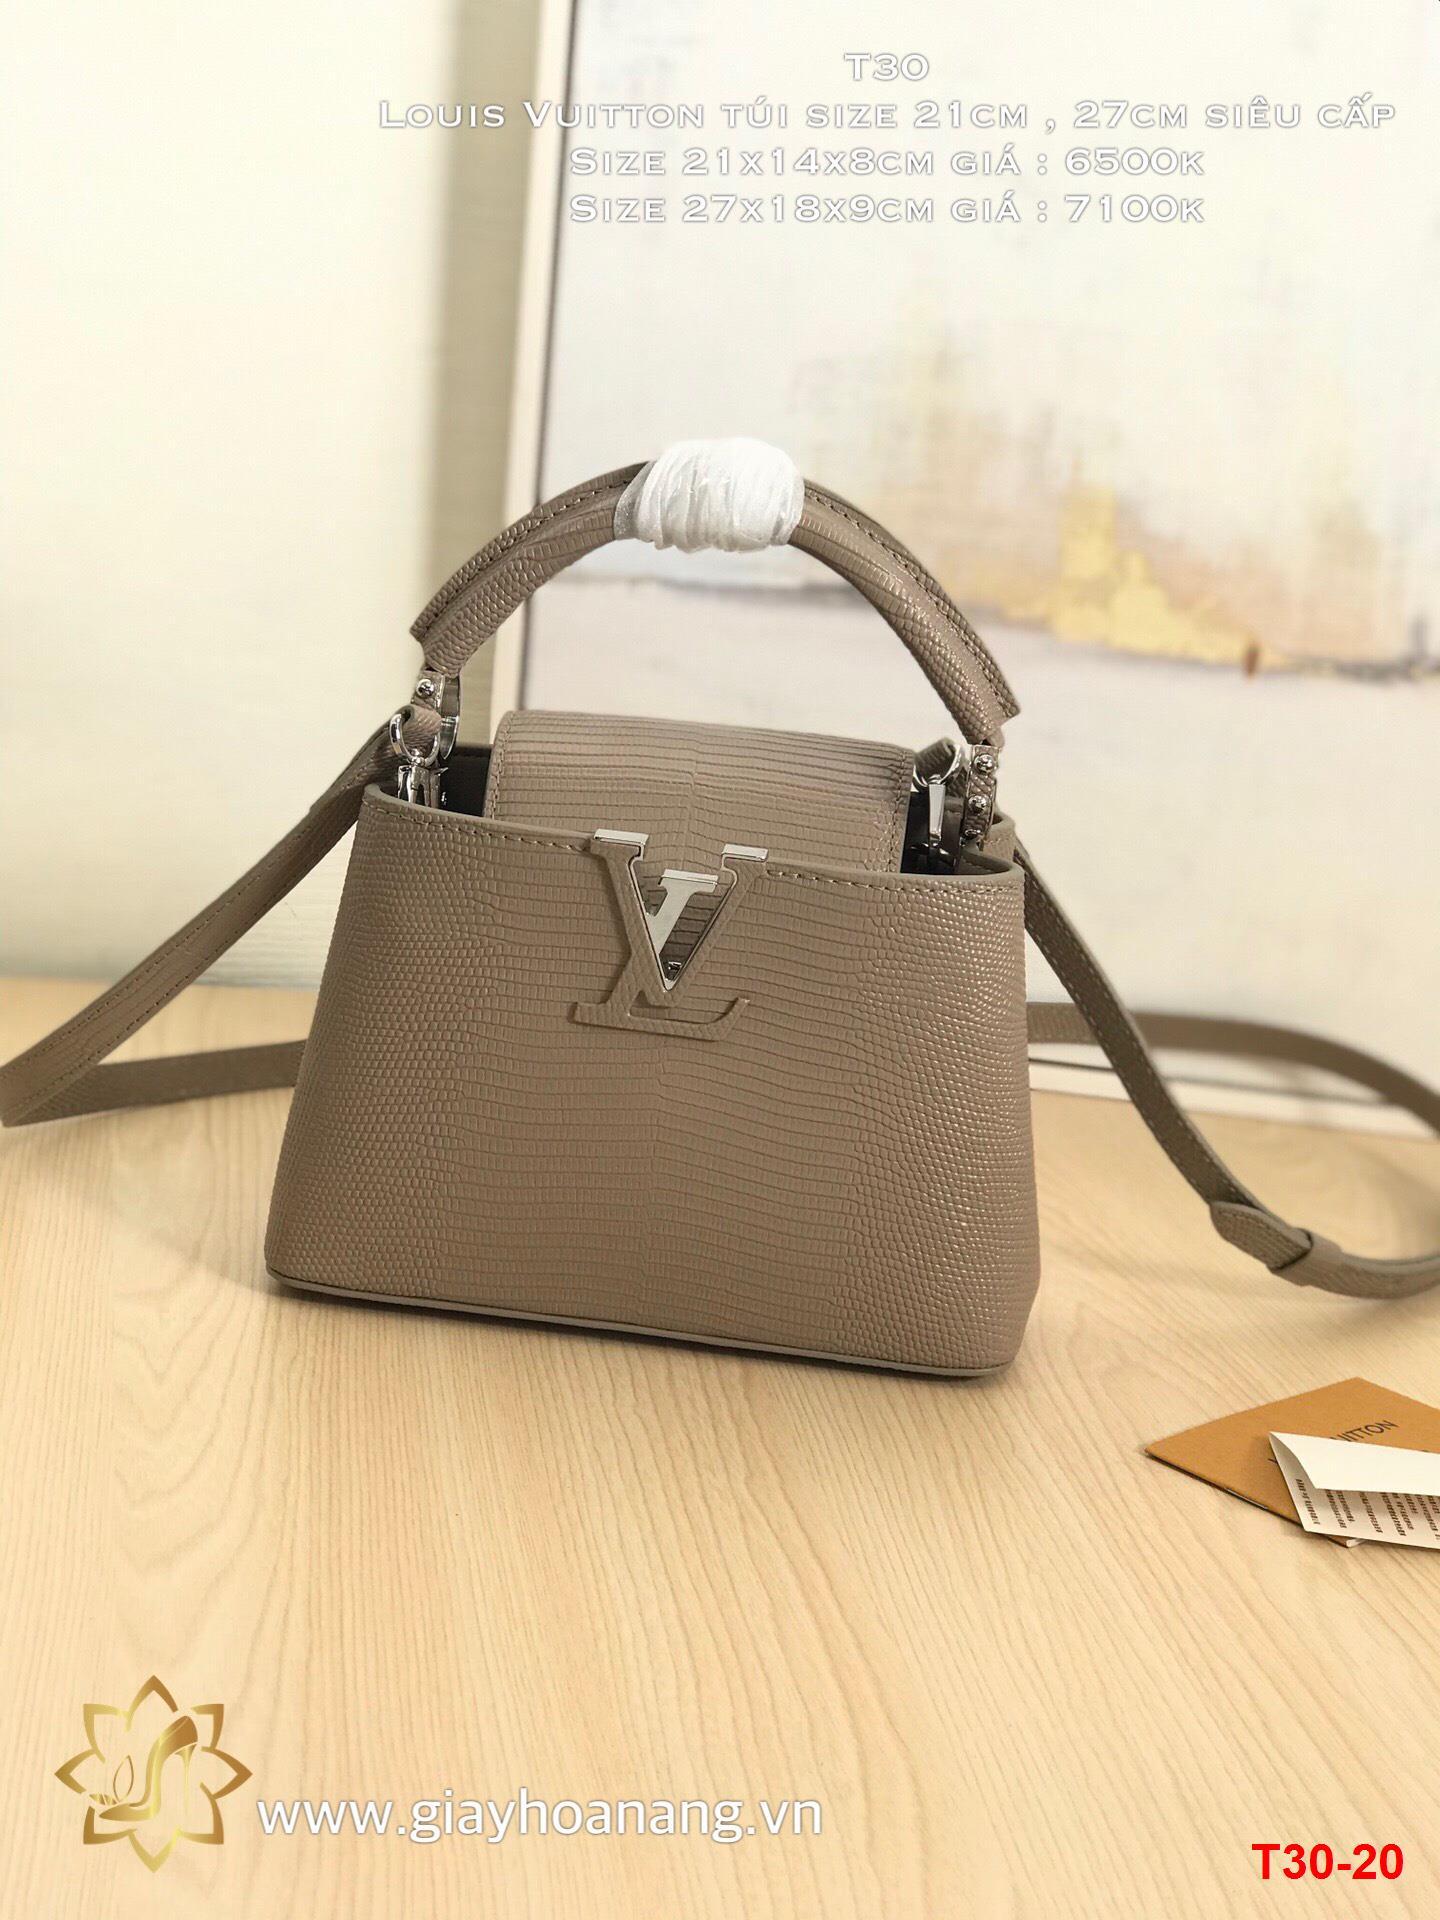 T30-20 Louis Vuitton túi size 21cm , 27cm siêu cấp